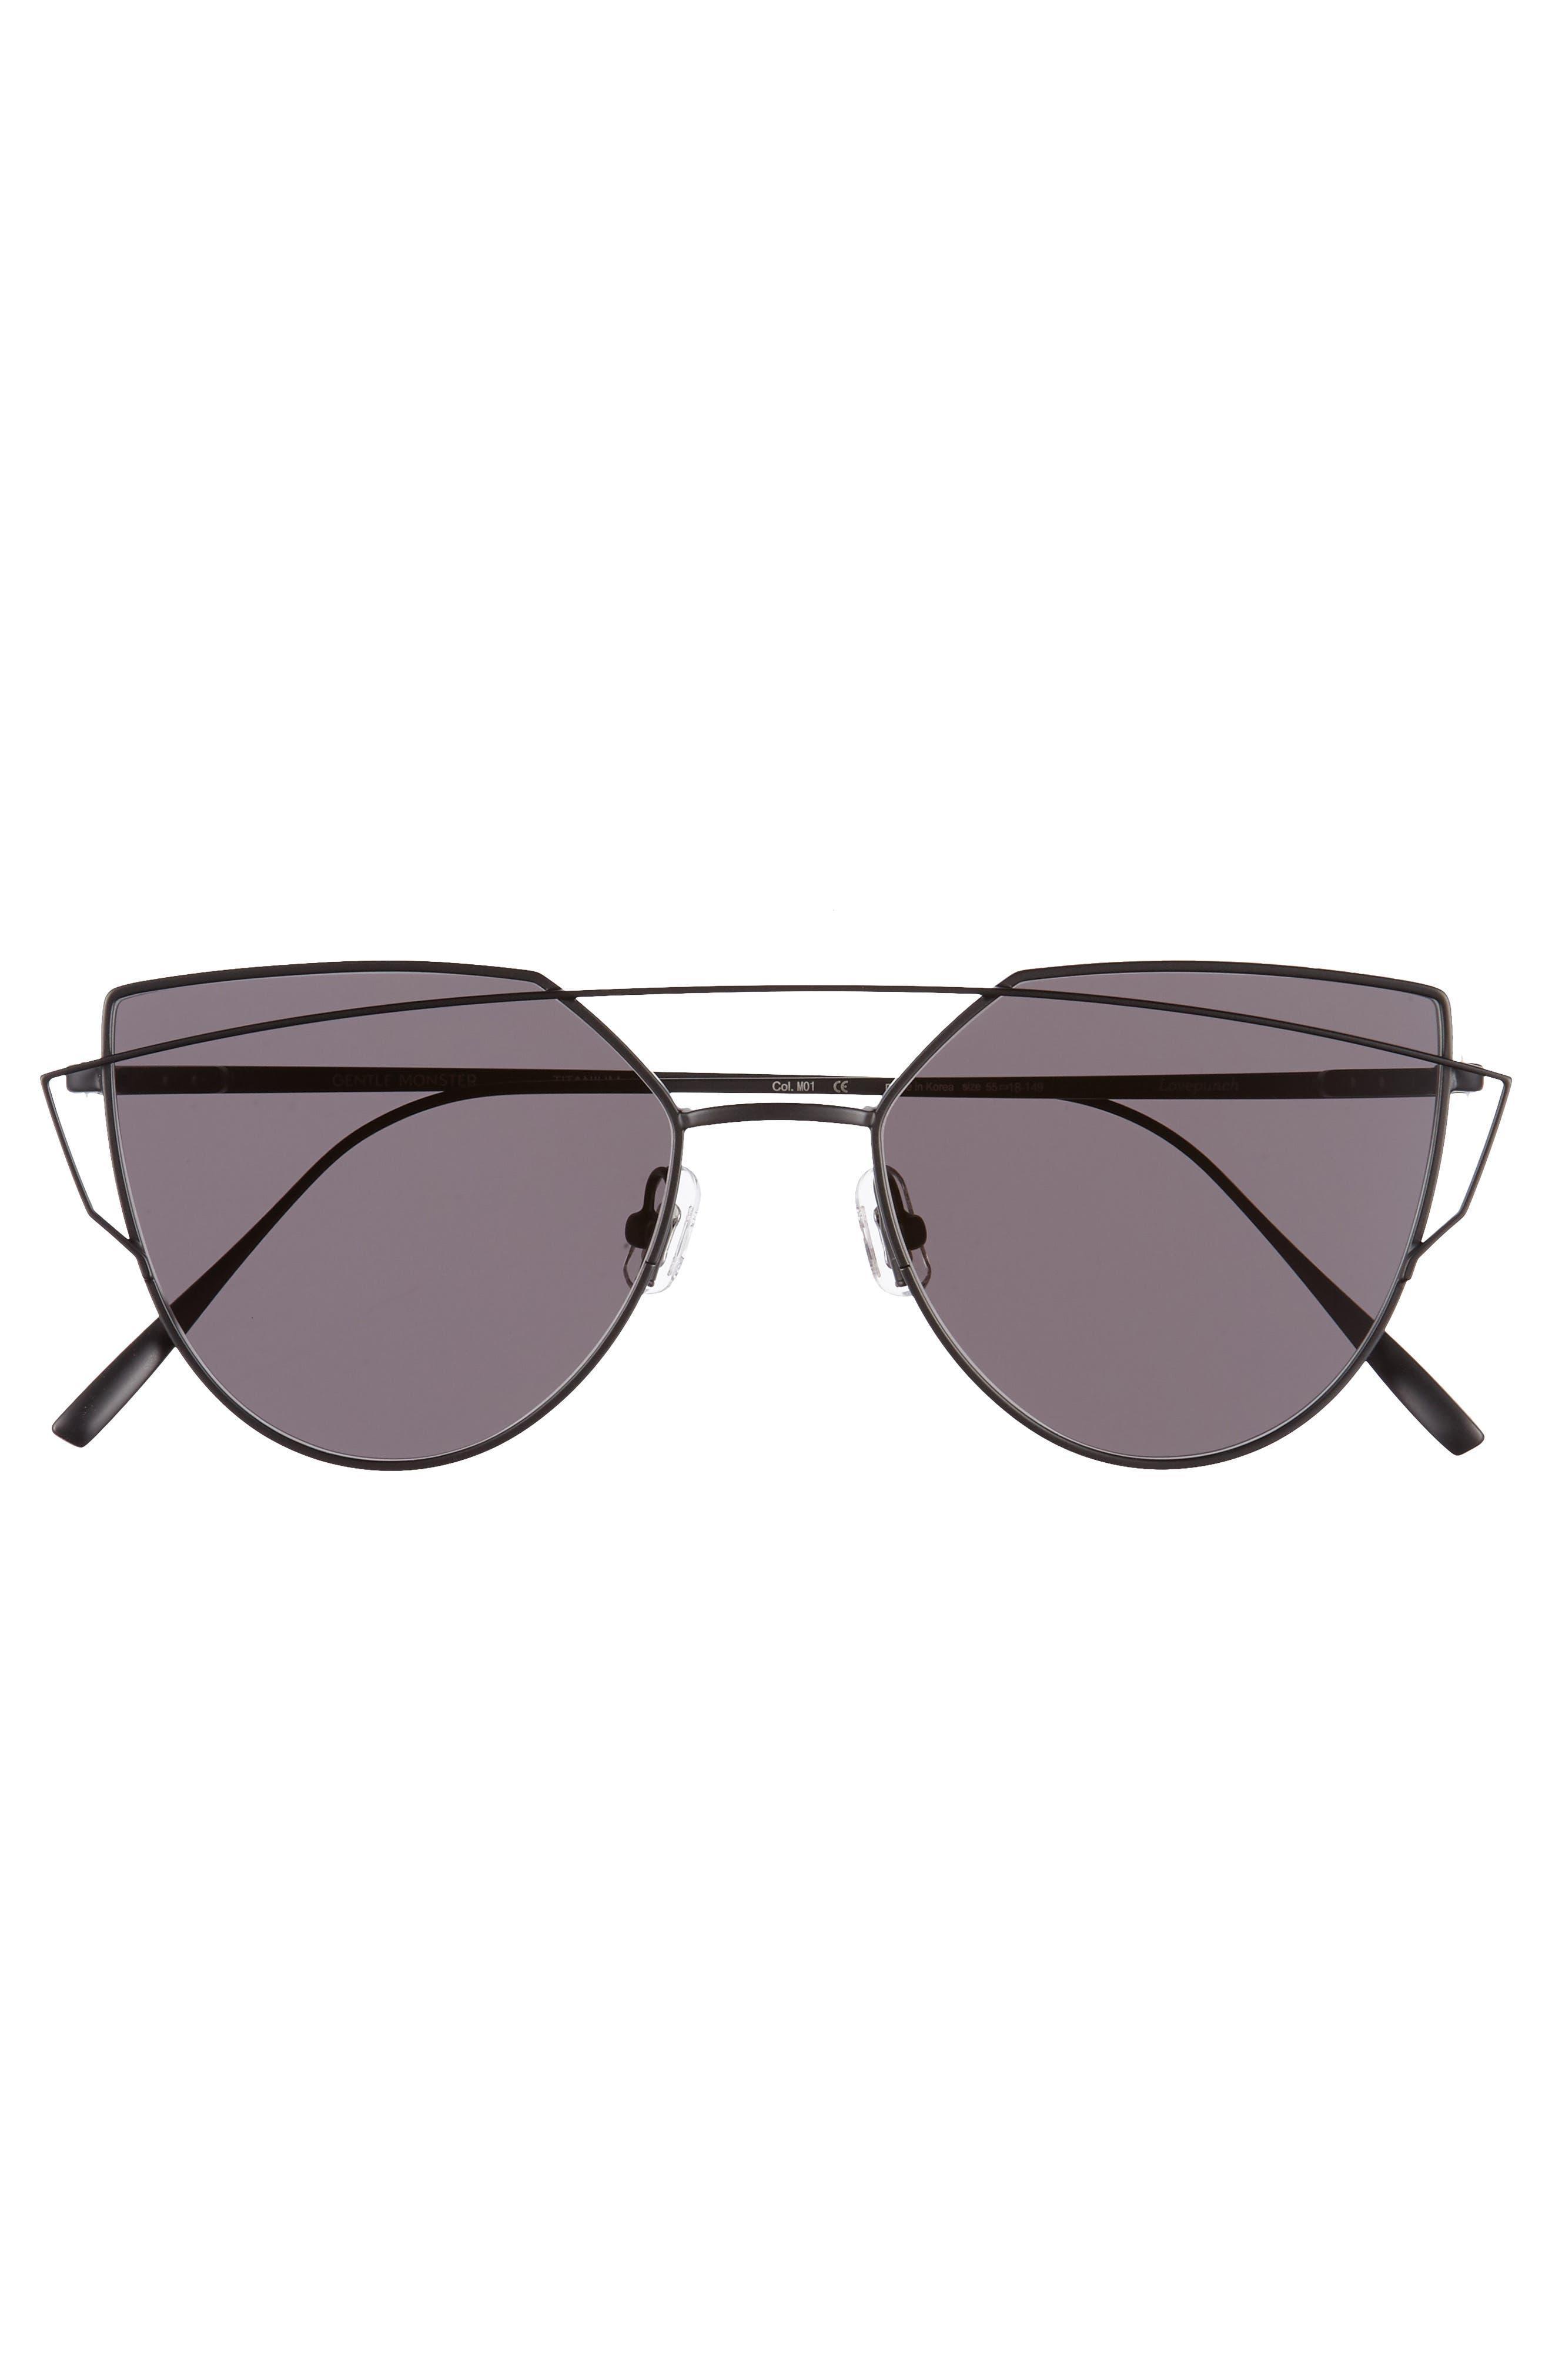 Love Punch 55mm Titanium Aviator Sunglasses,                             Alternate thumbnail 3, color,                             001